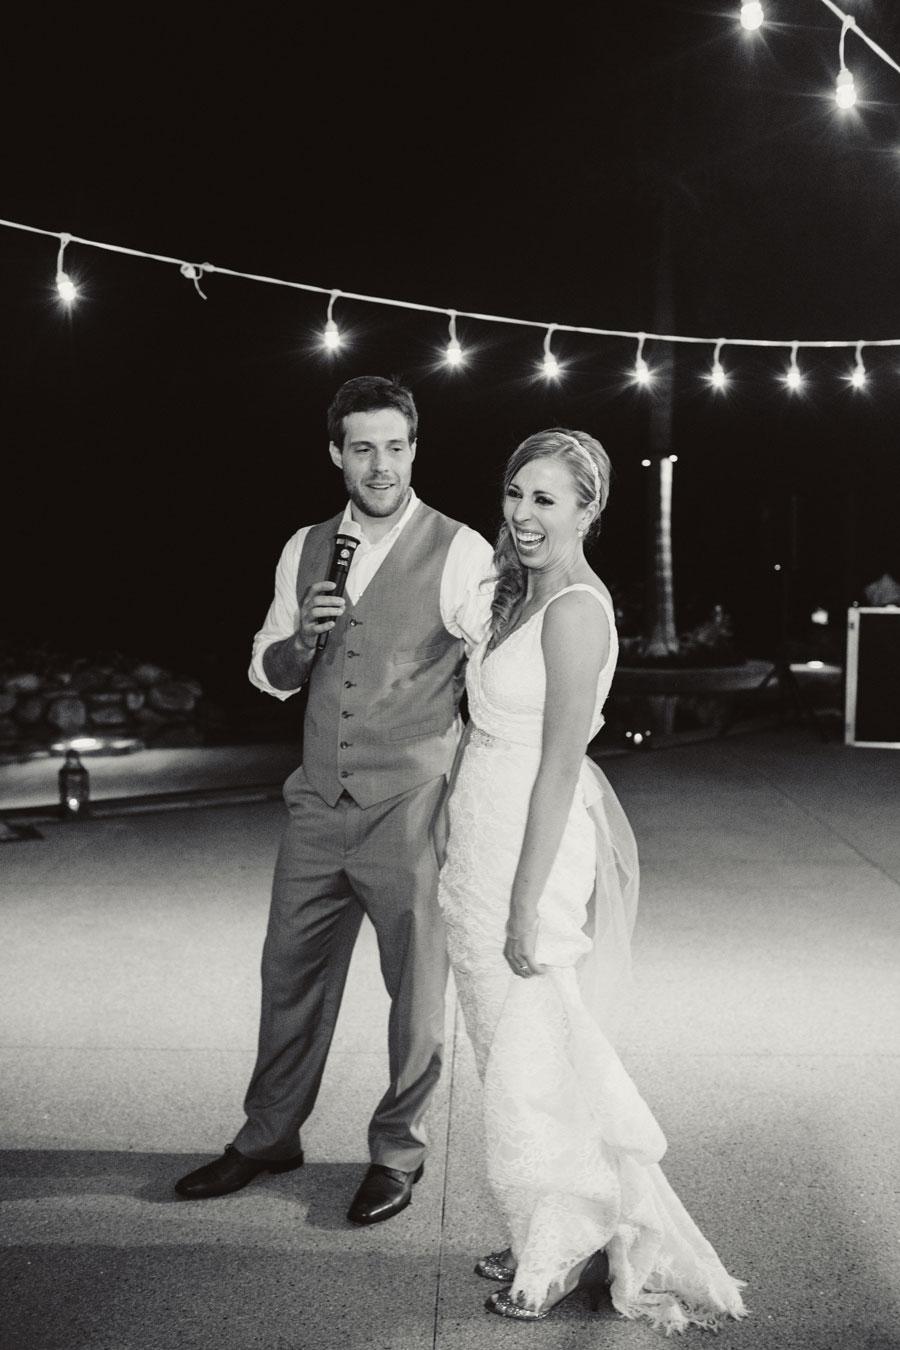 garza-blanca-resort-mexico-wedding-088